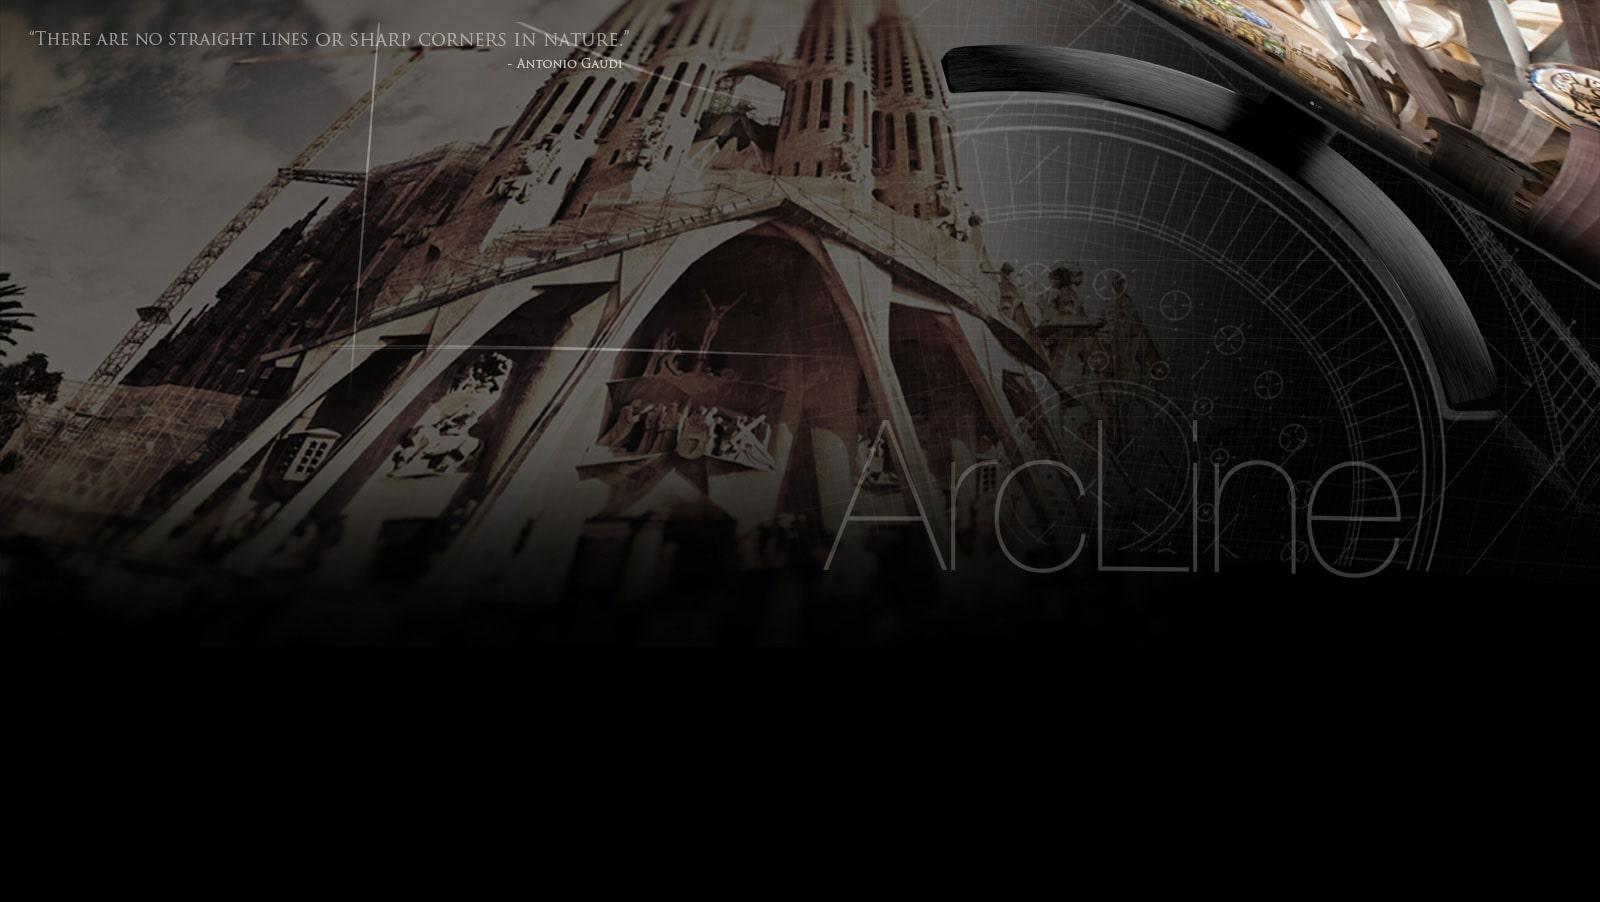 Arcline Design